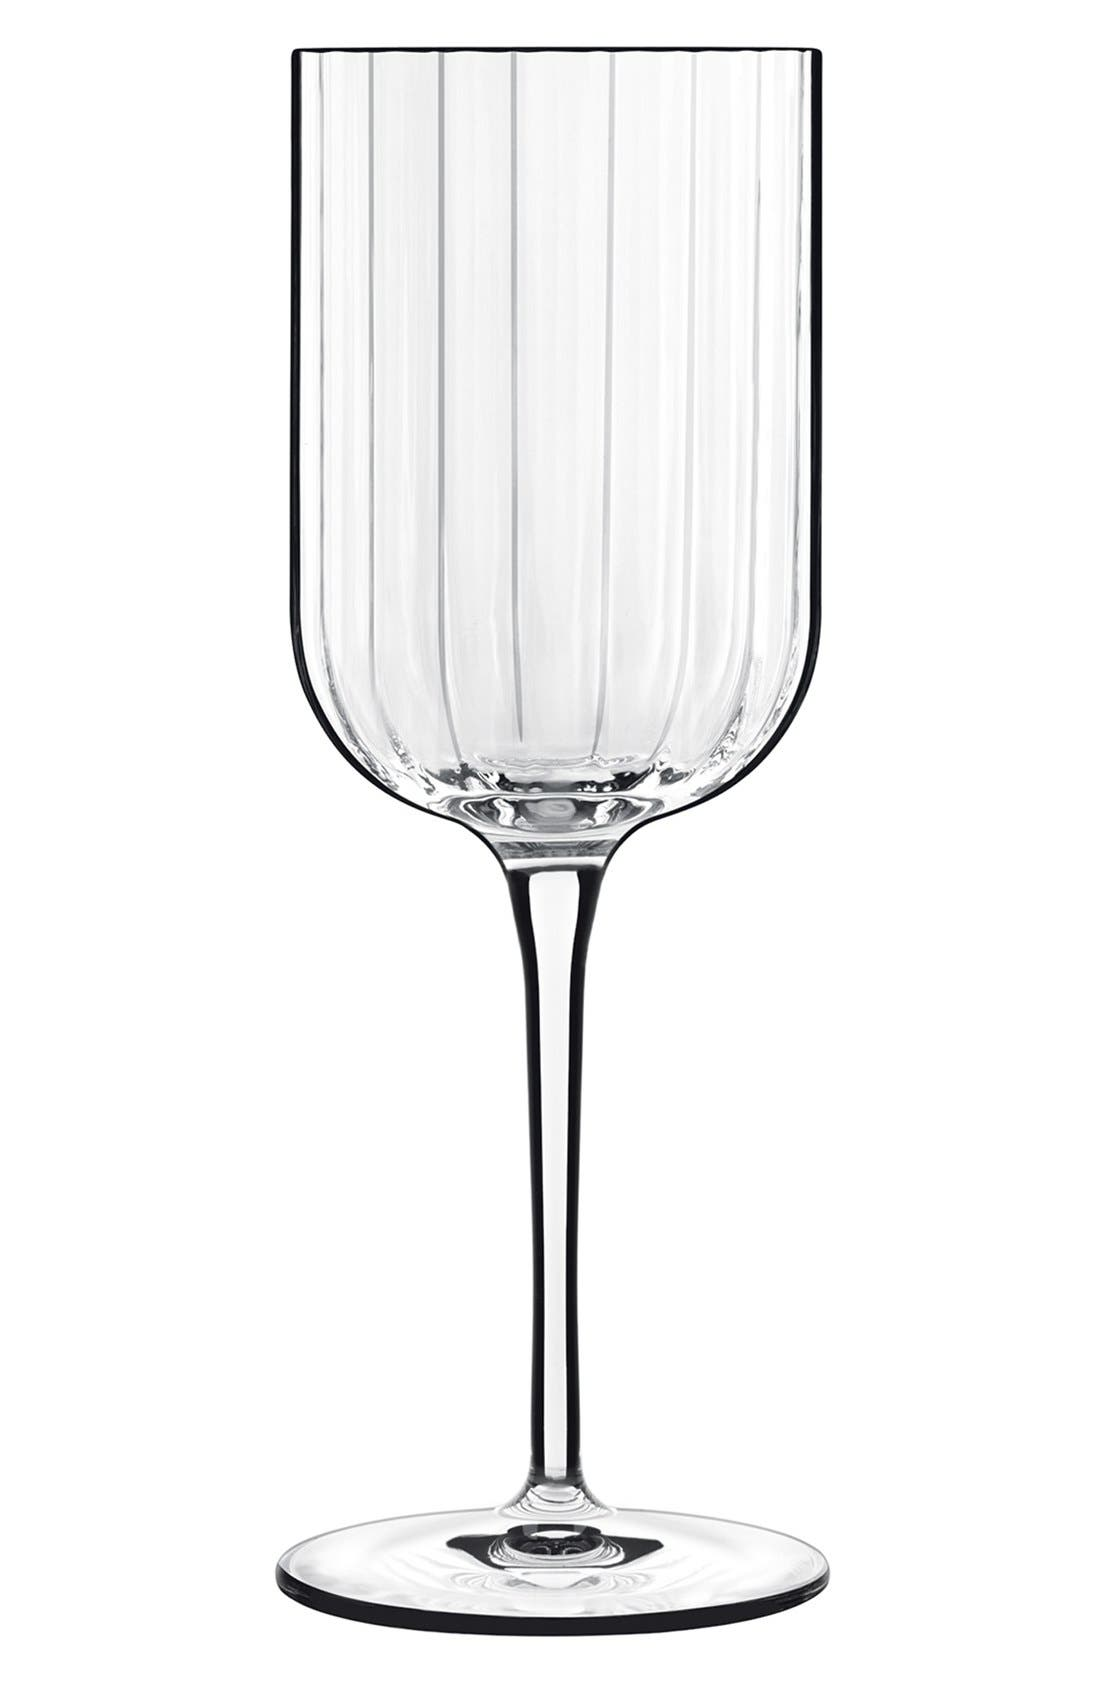 Main Image - Luigi Bormioli 'Bach' Red Wine Glasses (Set of 4)